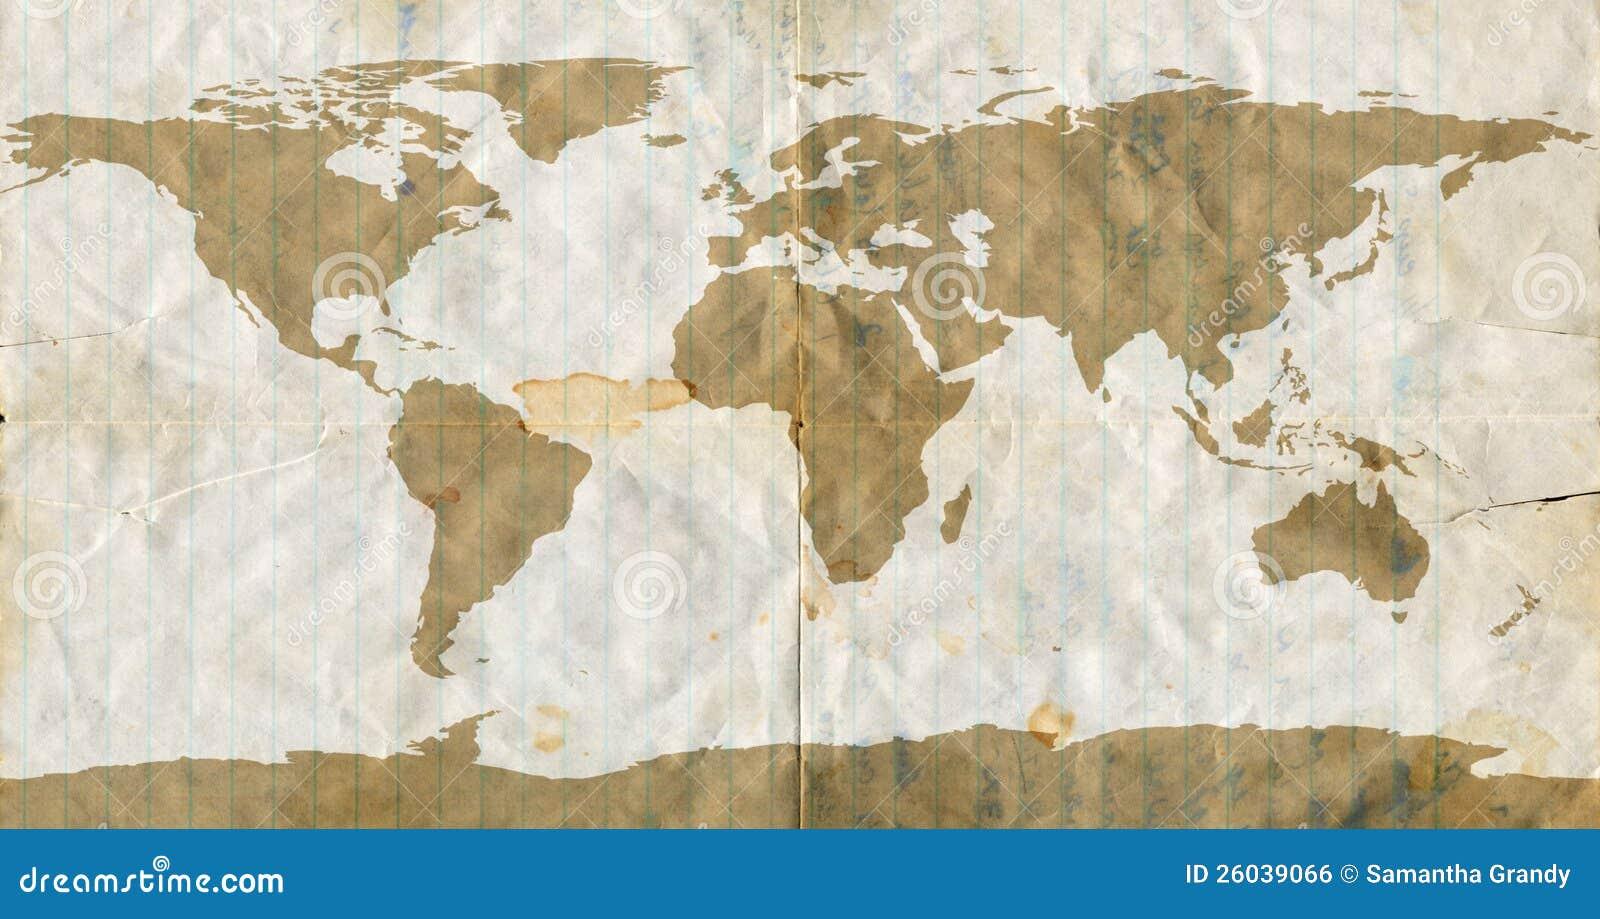 stained loose leaf paper world map stock illustration illustration